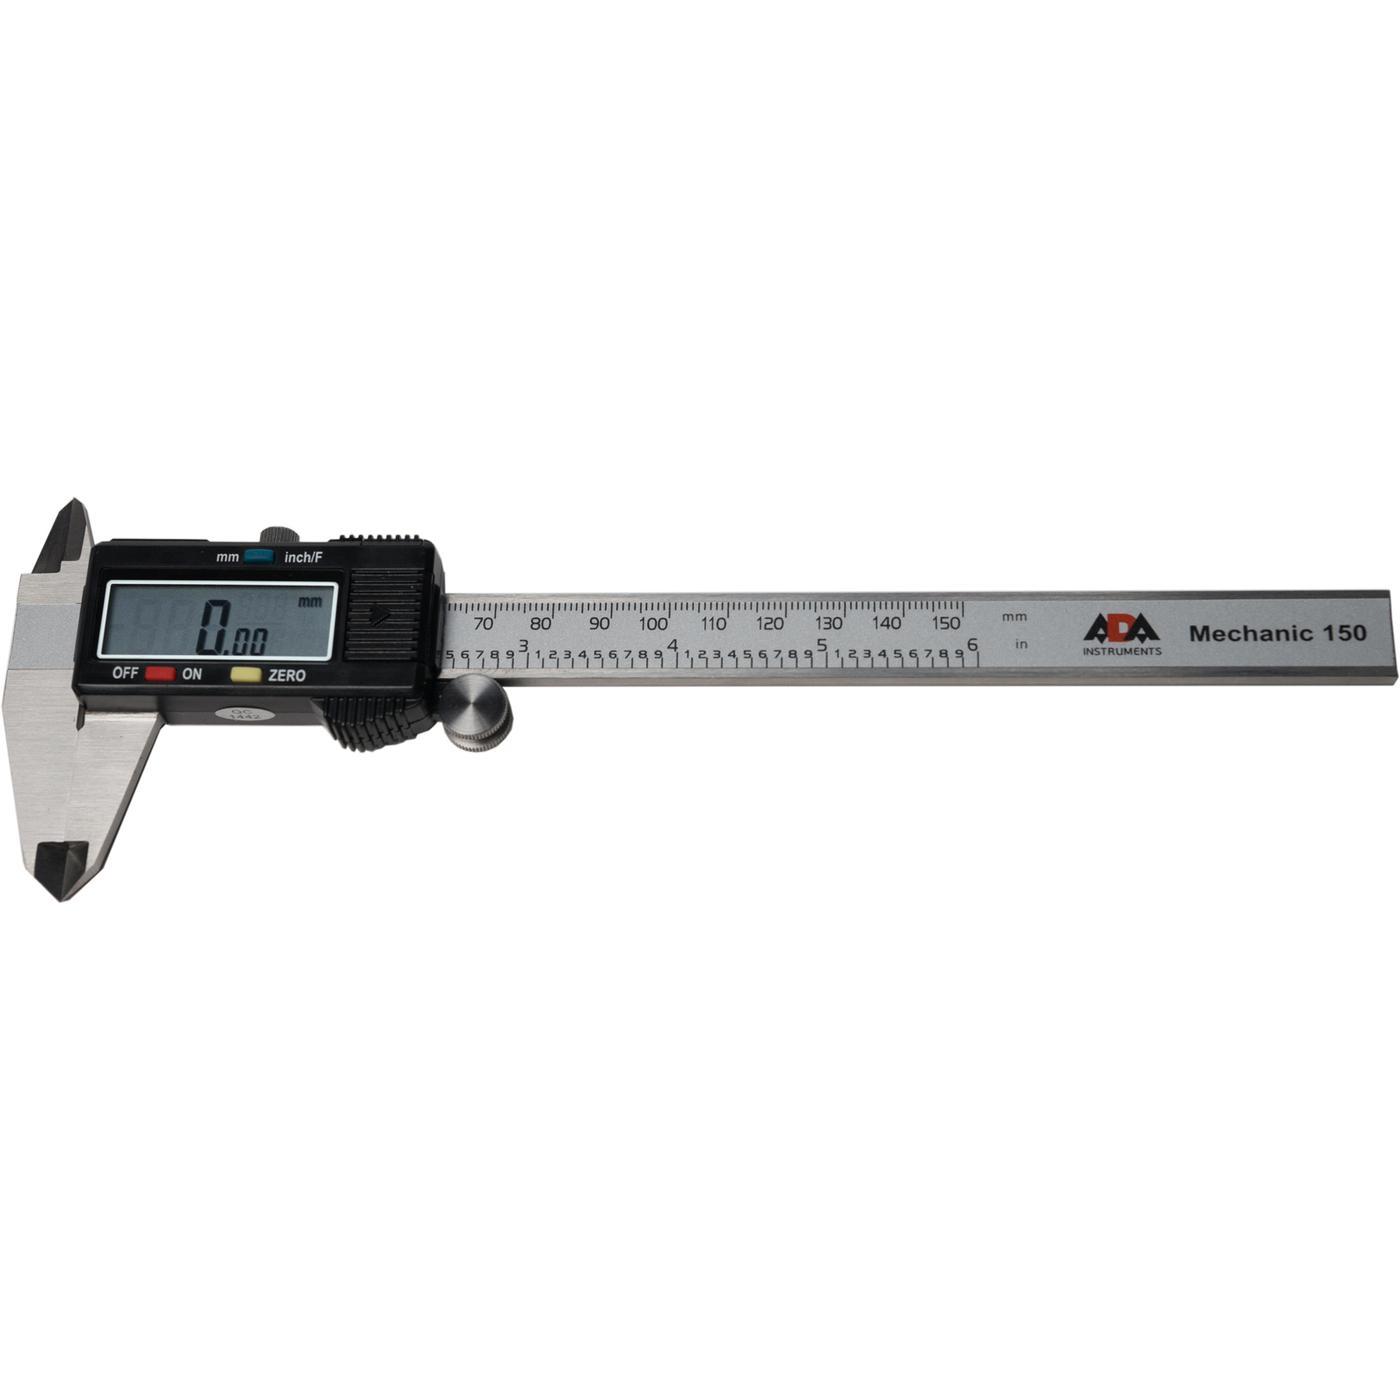 ADA instruments Mechanic 150 Pro